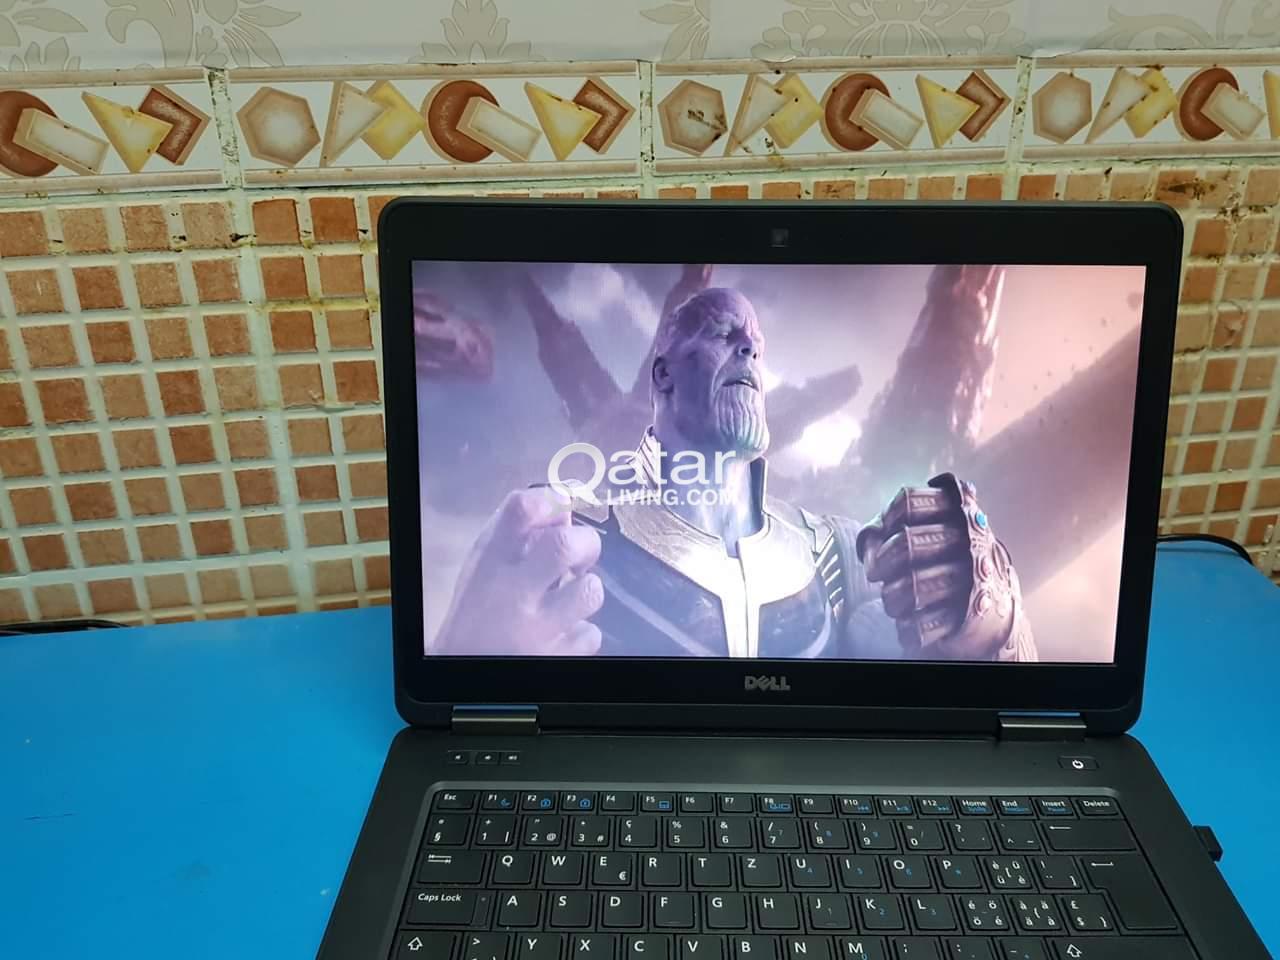 DELL LATITUDE E5440 (bonus speakers & printer) | Qatar Living